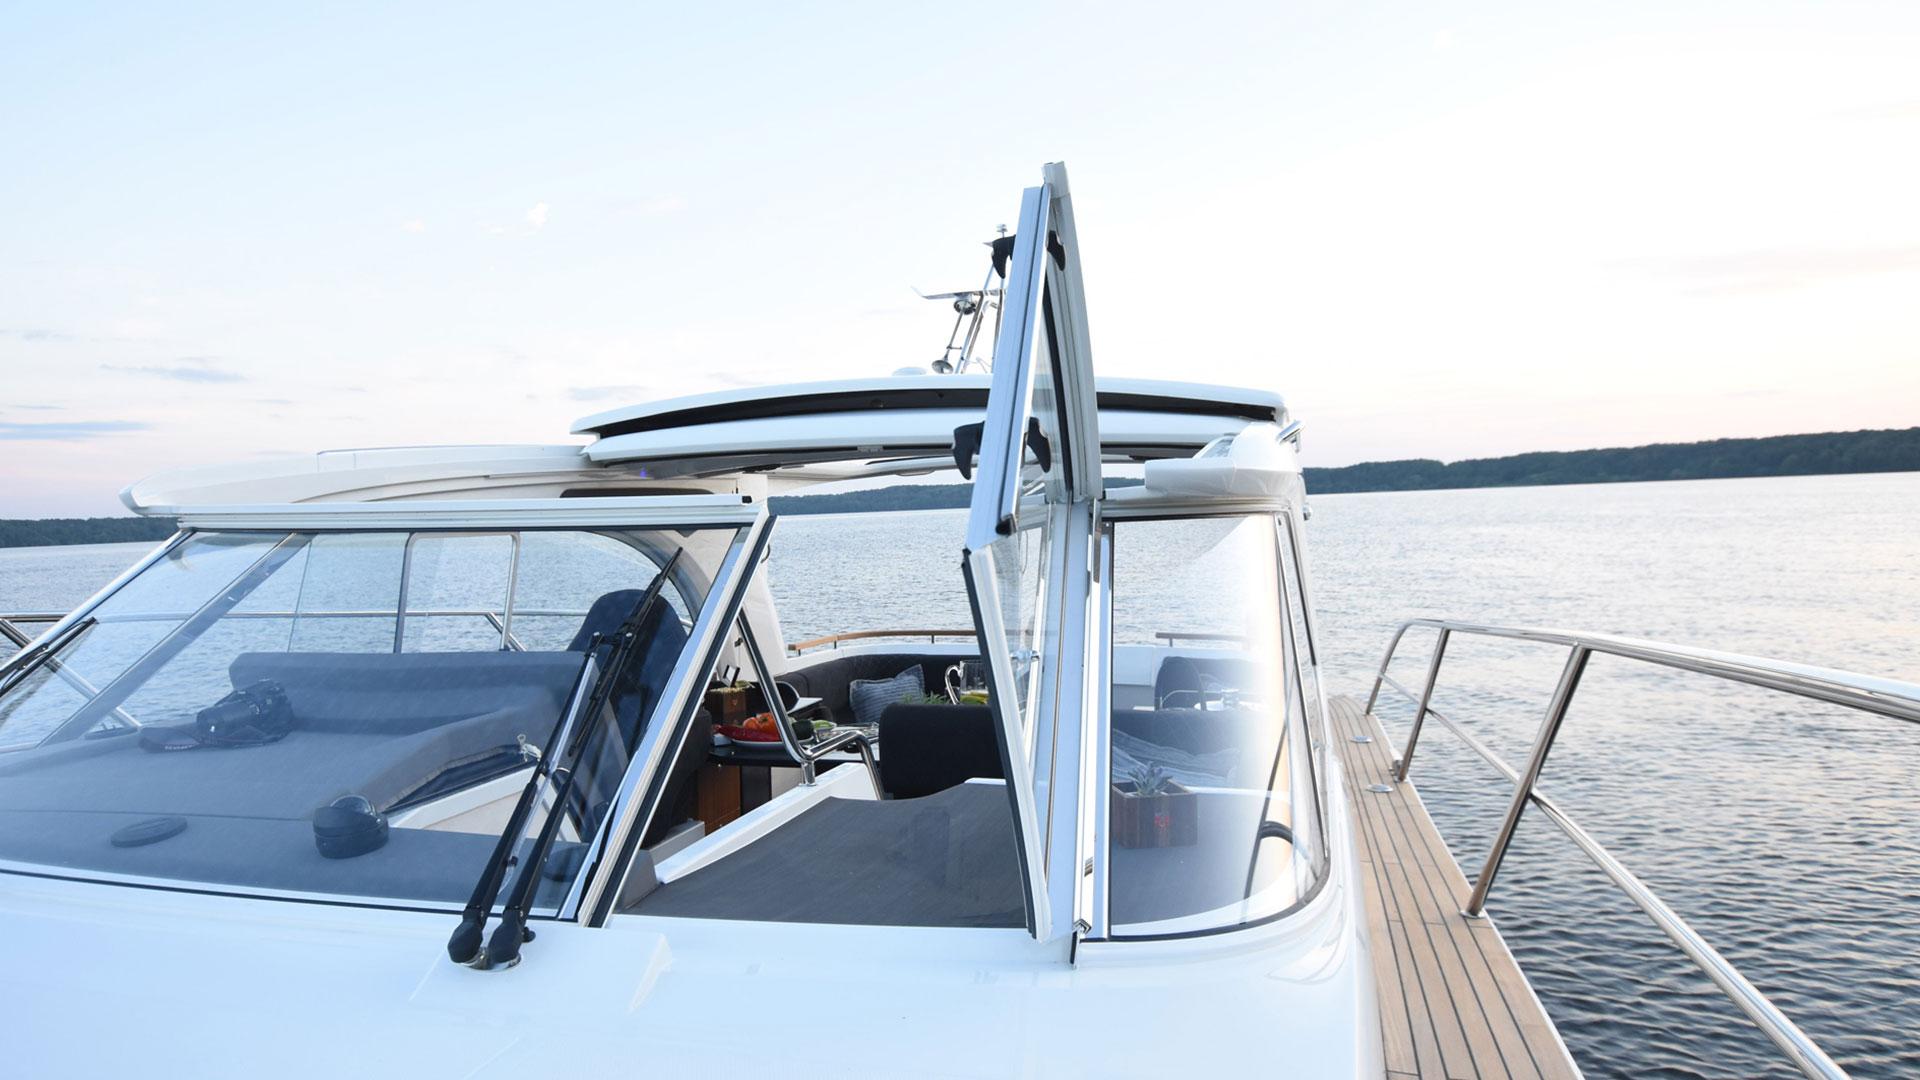 360 Cabriolet Cruiser Pit